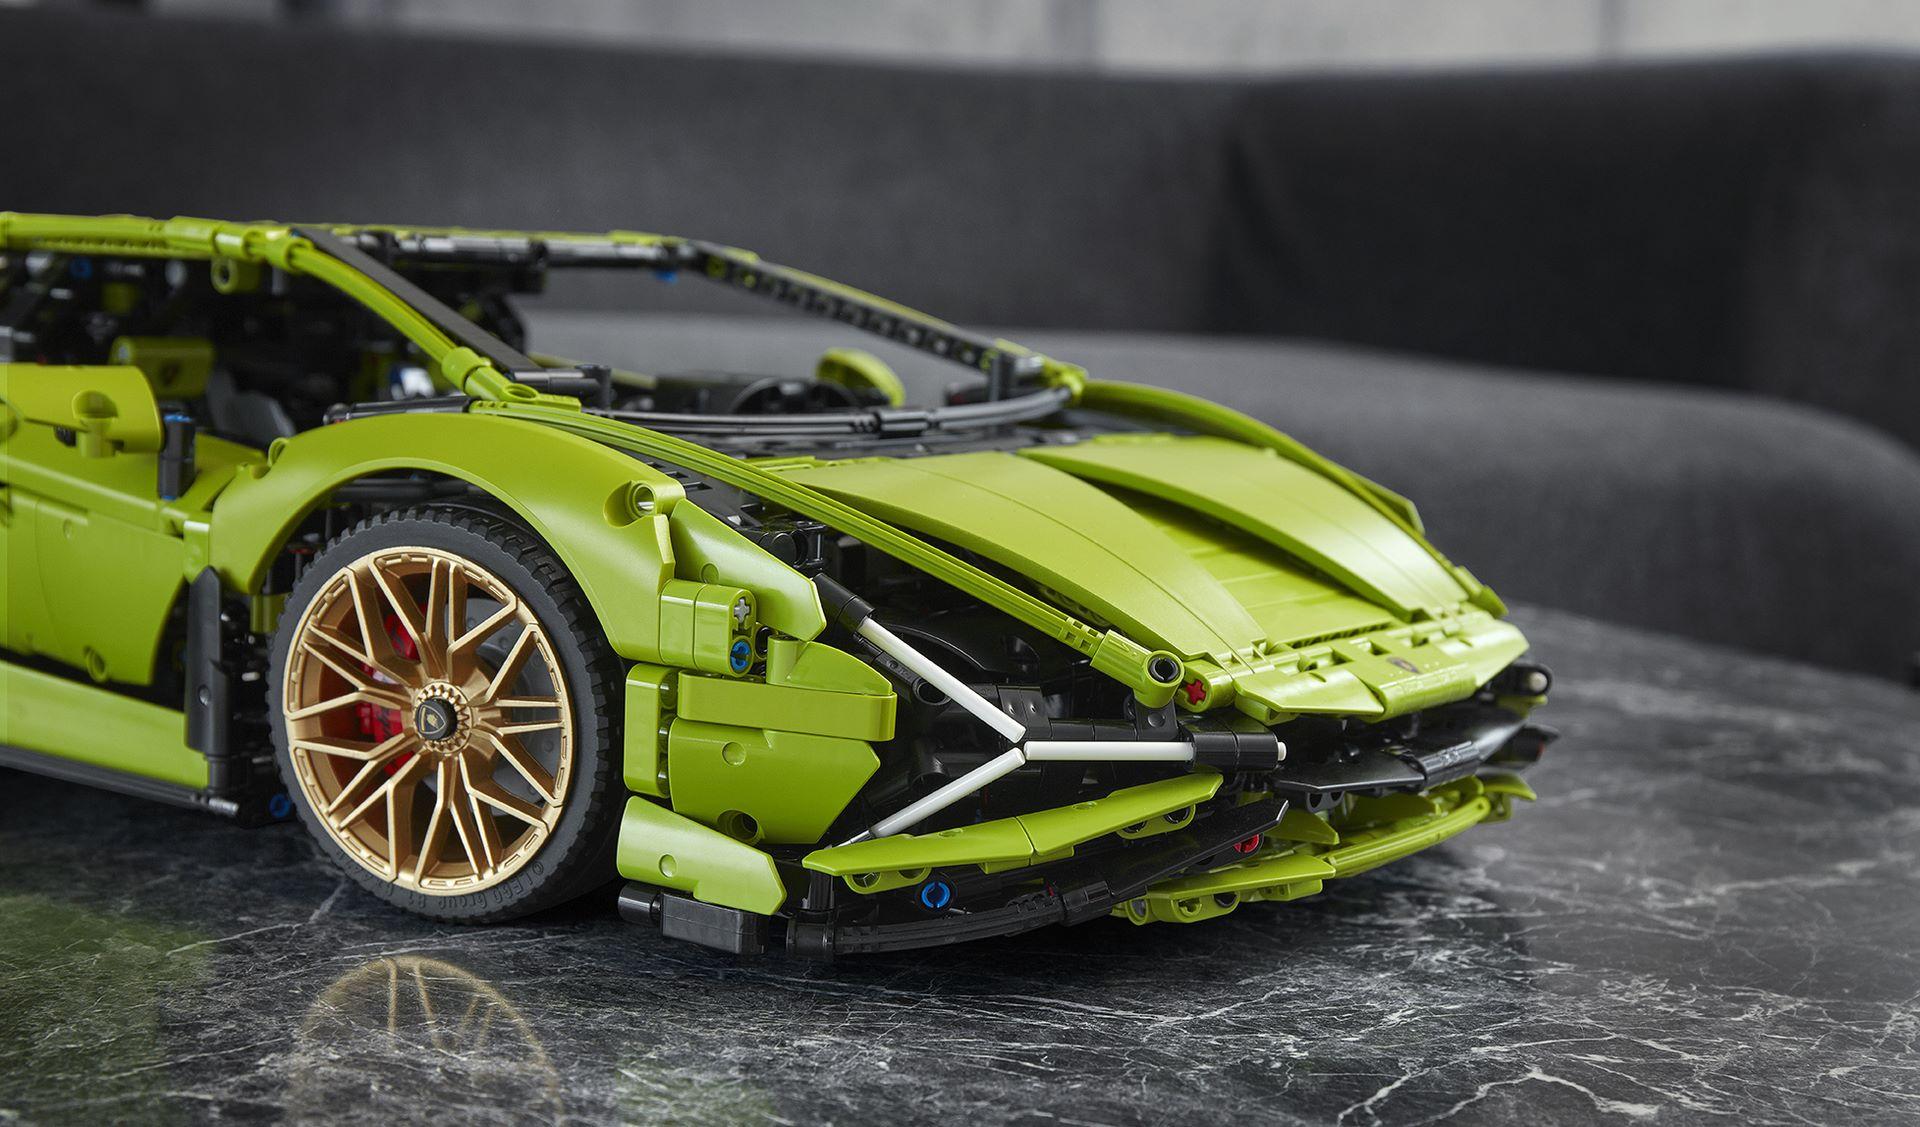 Lamborghini-Sian-FKP-37-Lego-Technic-6